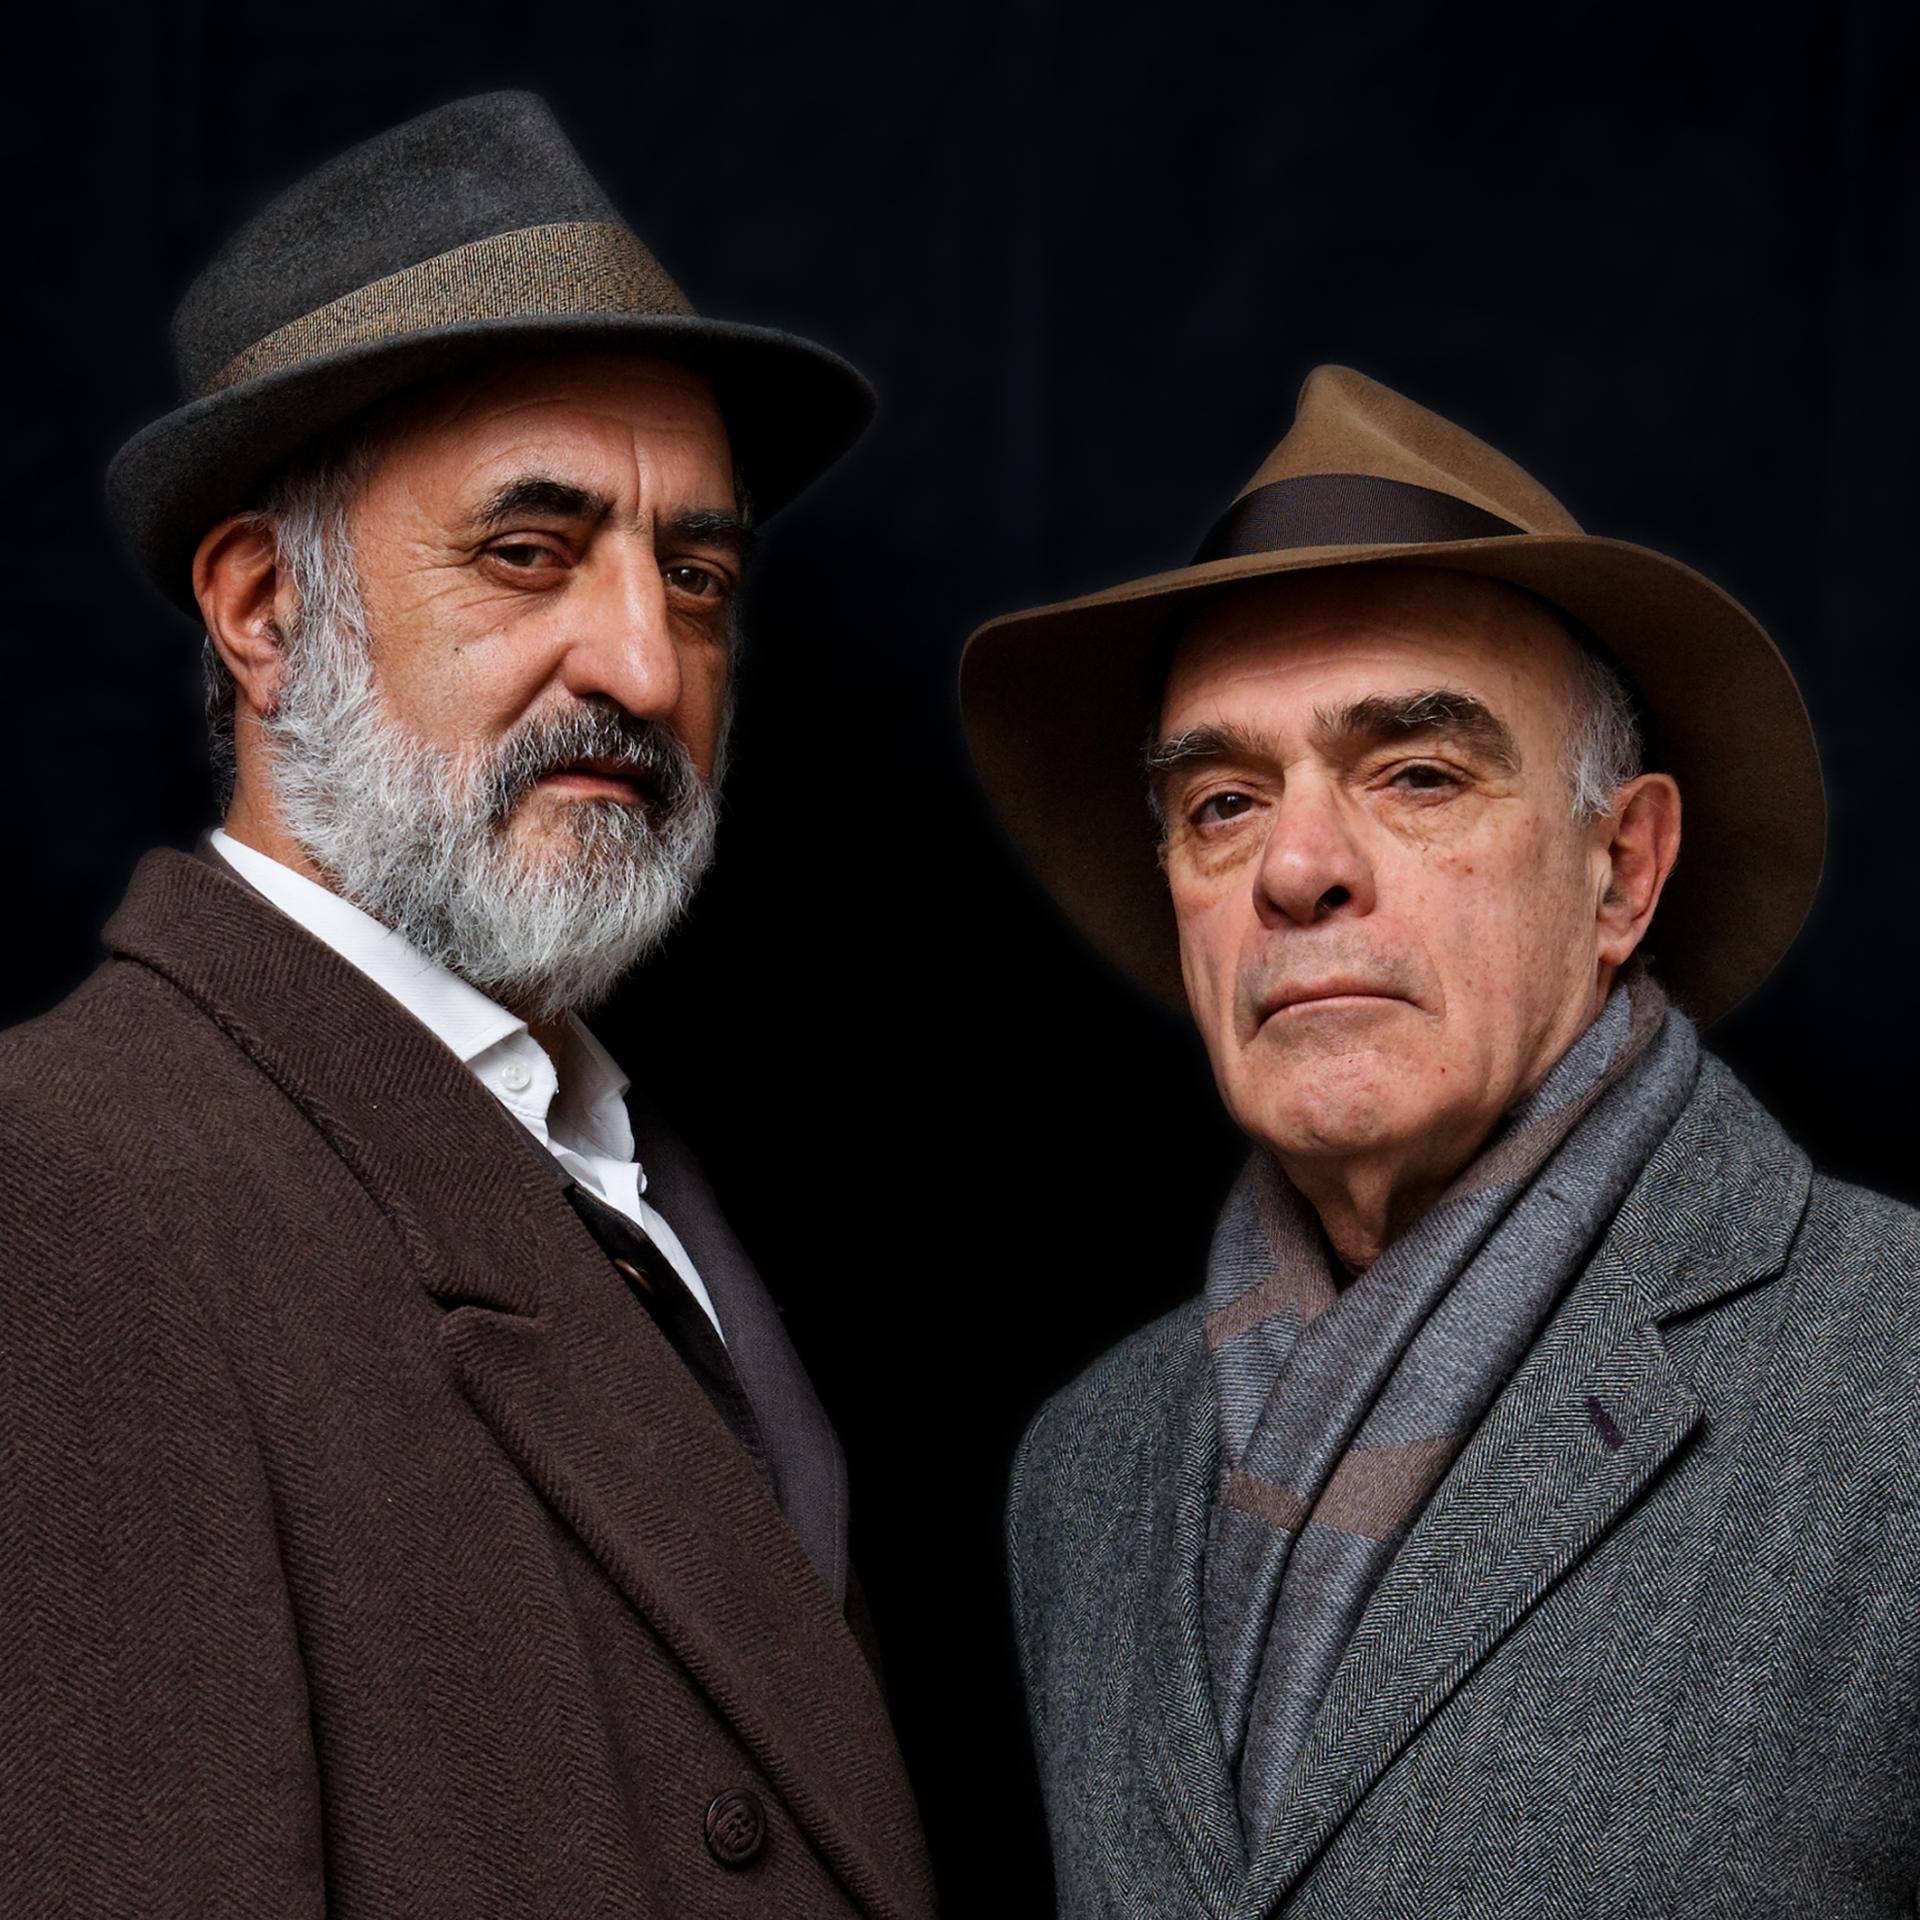 Les inspecteurs (Fernand Jourdain et Bruno Monnier)